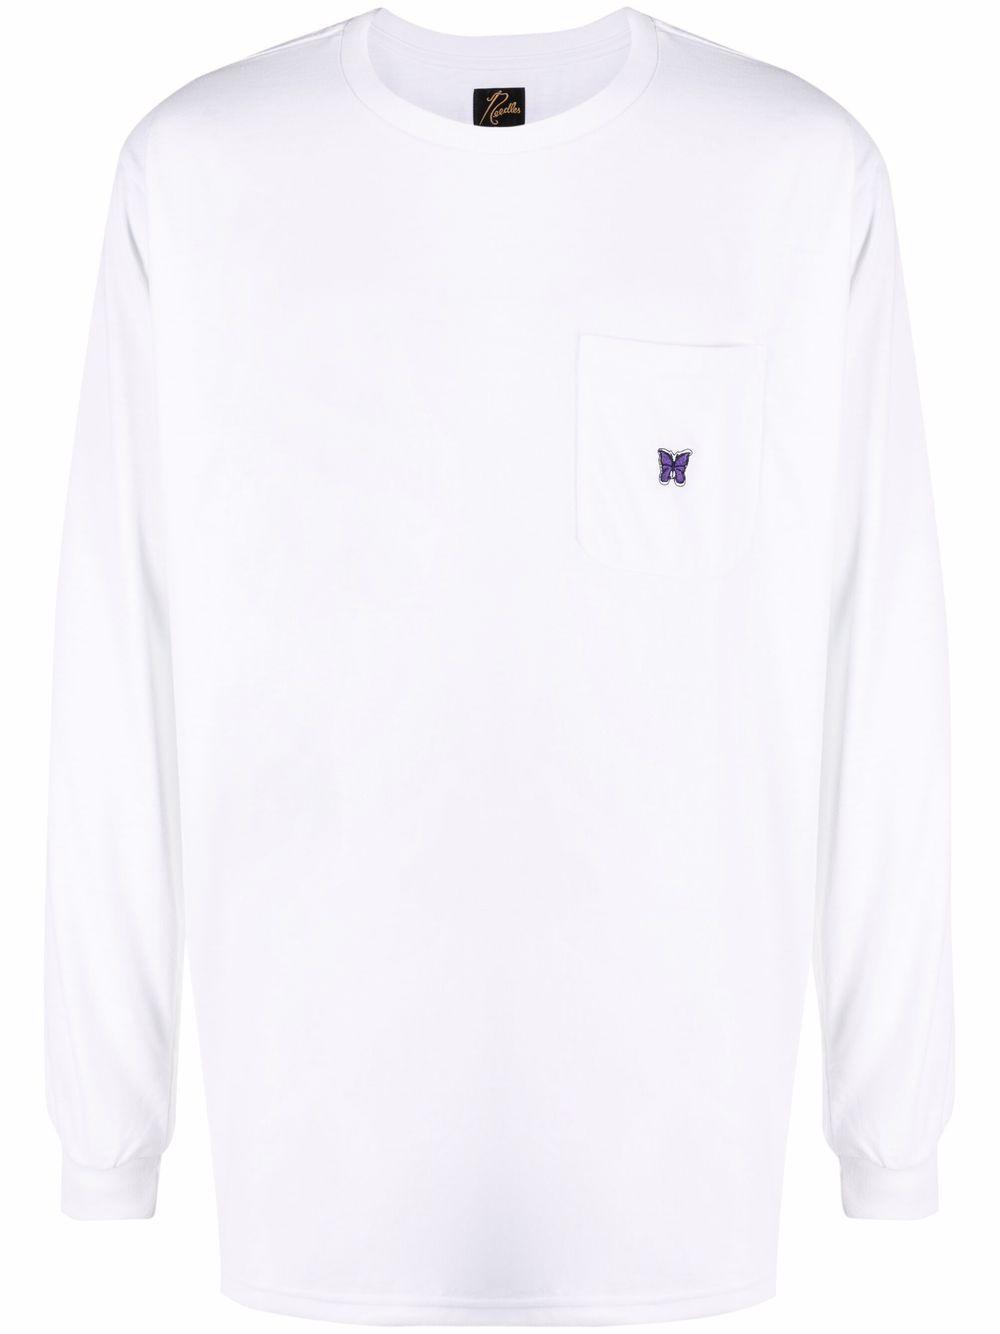 Needles t-shirt manica lunga pocket uomo bianco NEEDLES   T-shirt   IN207WHITE